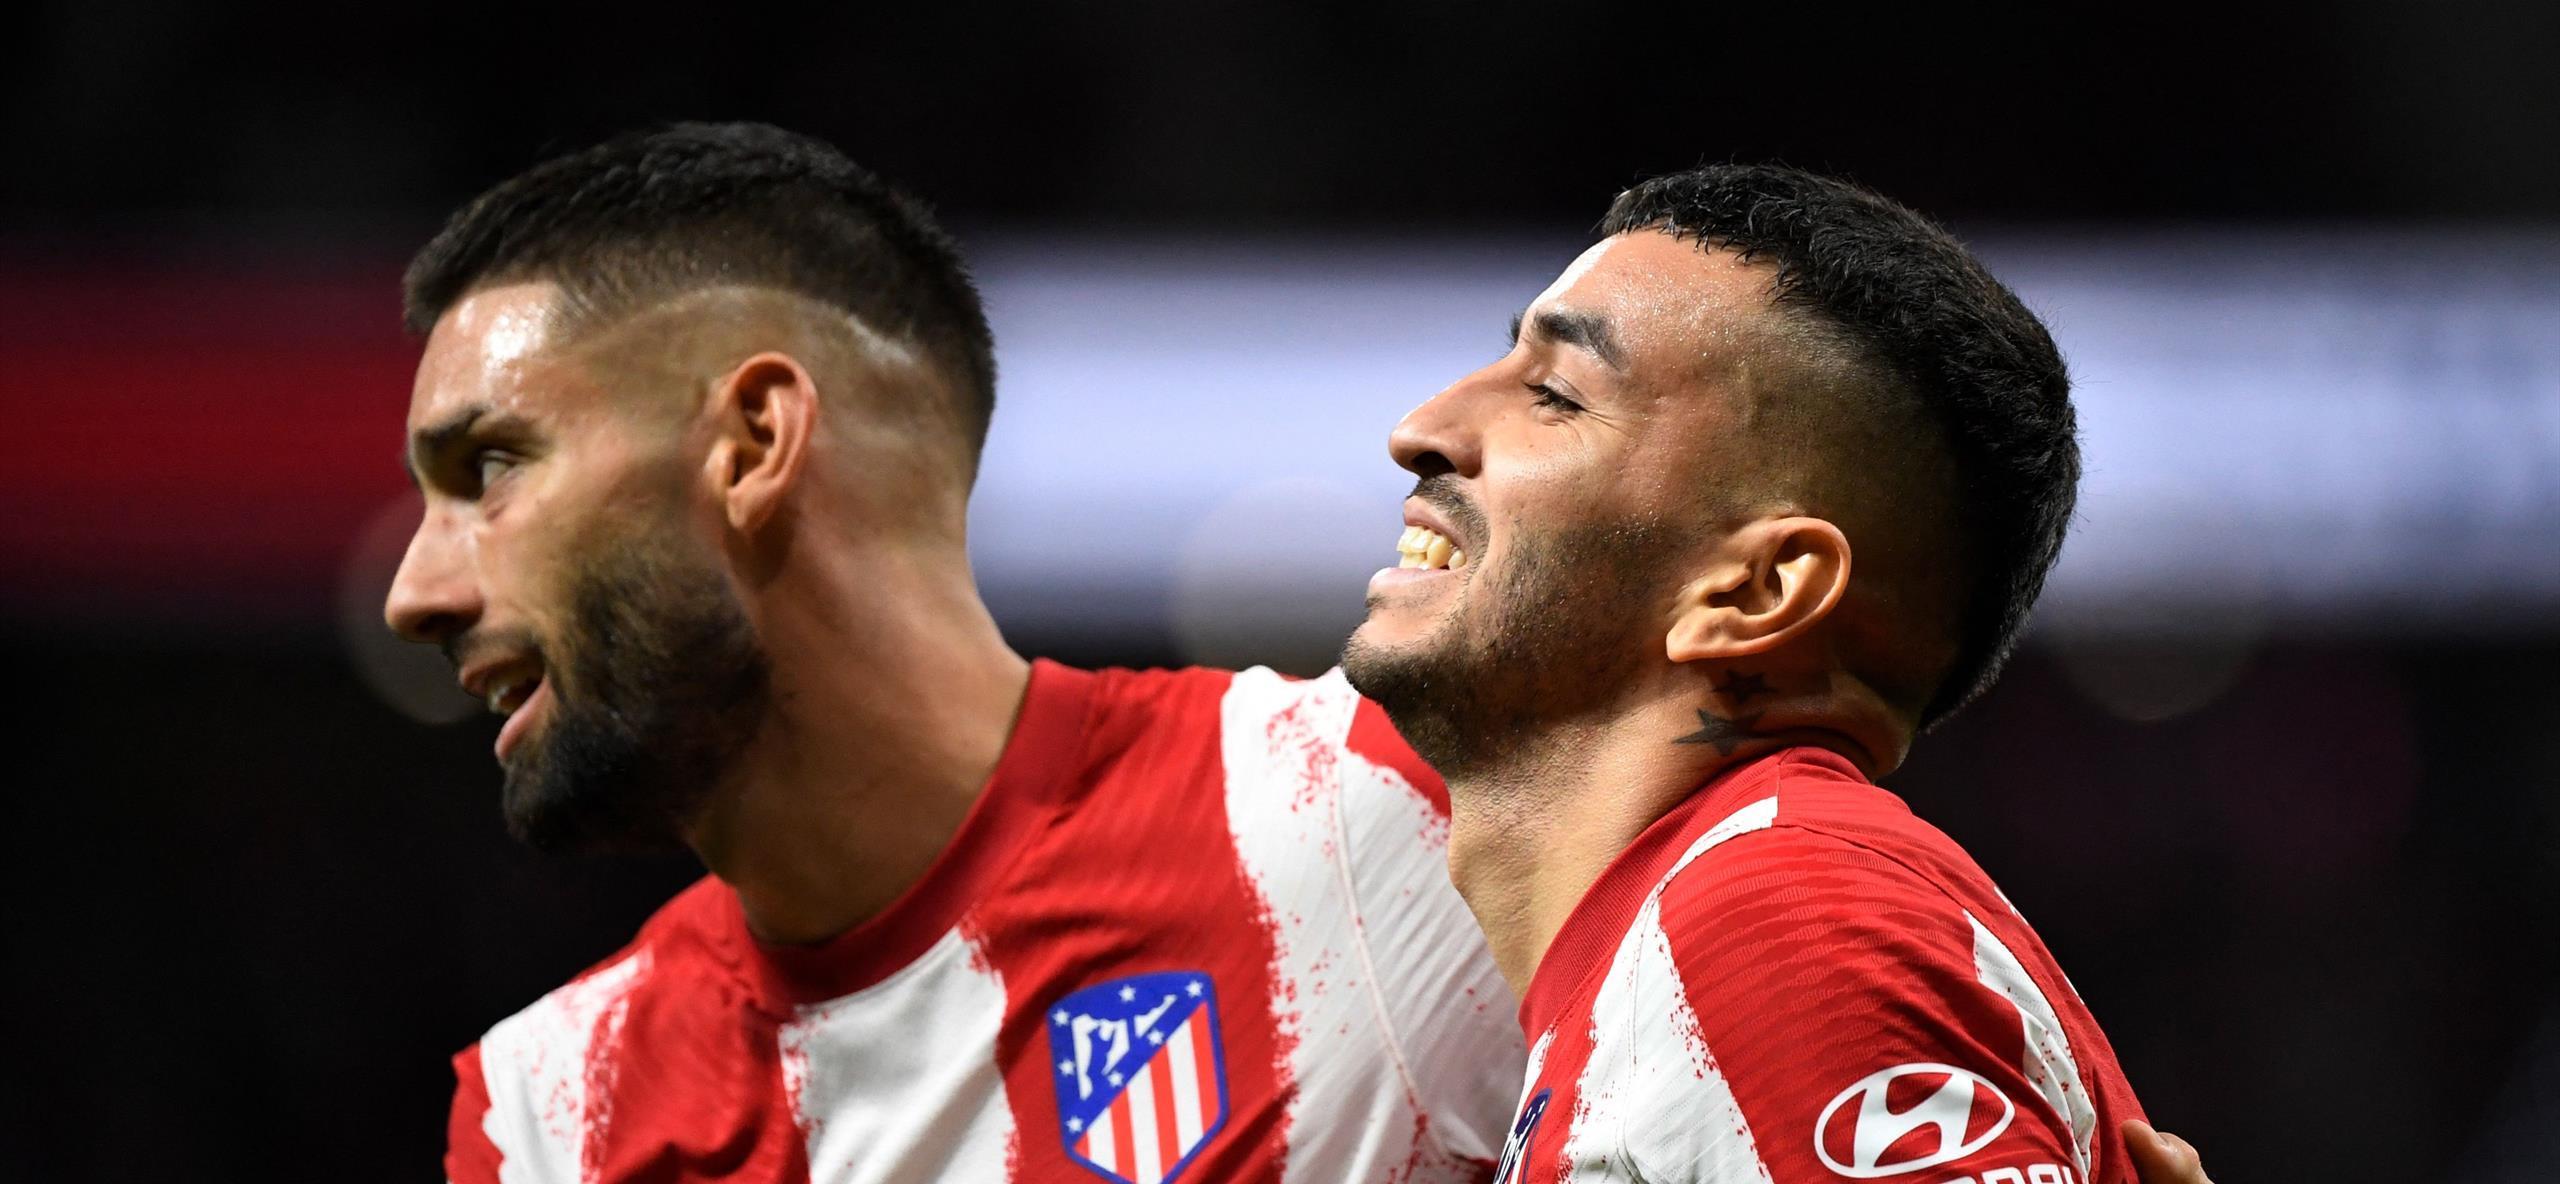 Espagne: l'Atlético Madrid arrache le nul 2-2 contre Villarreal